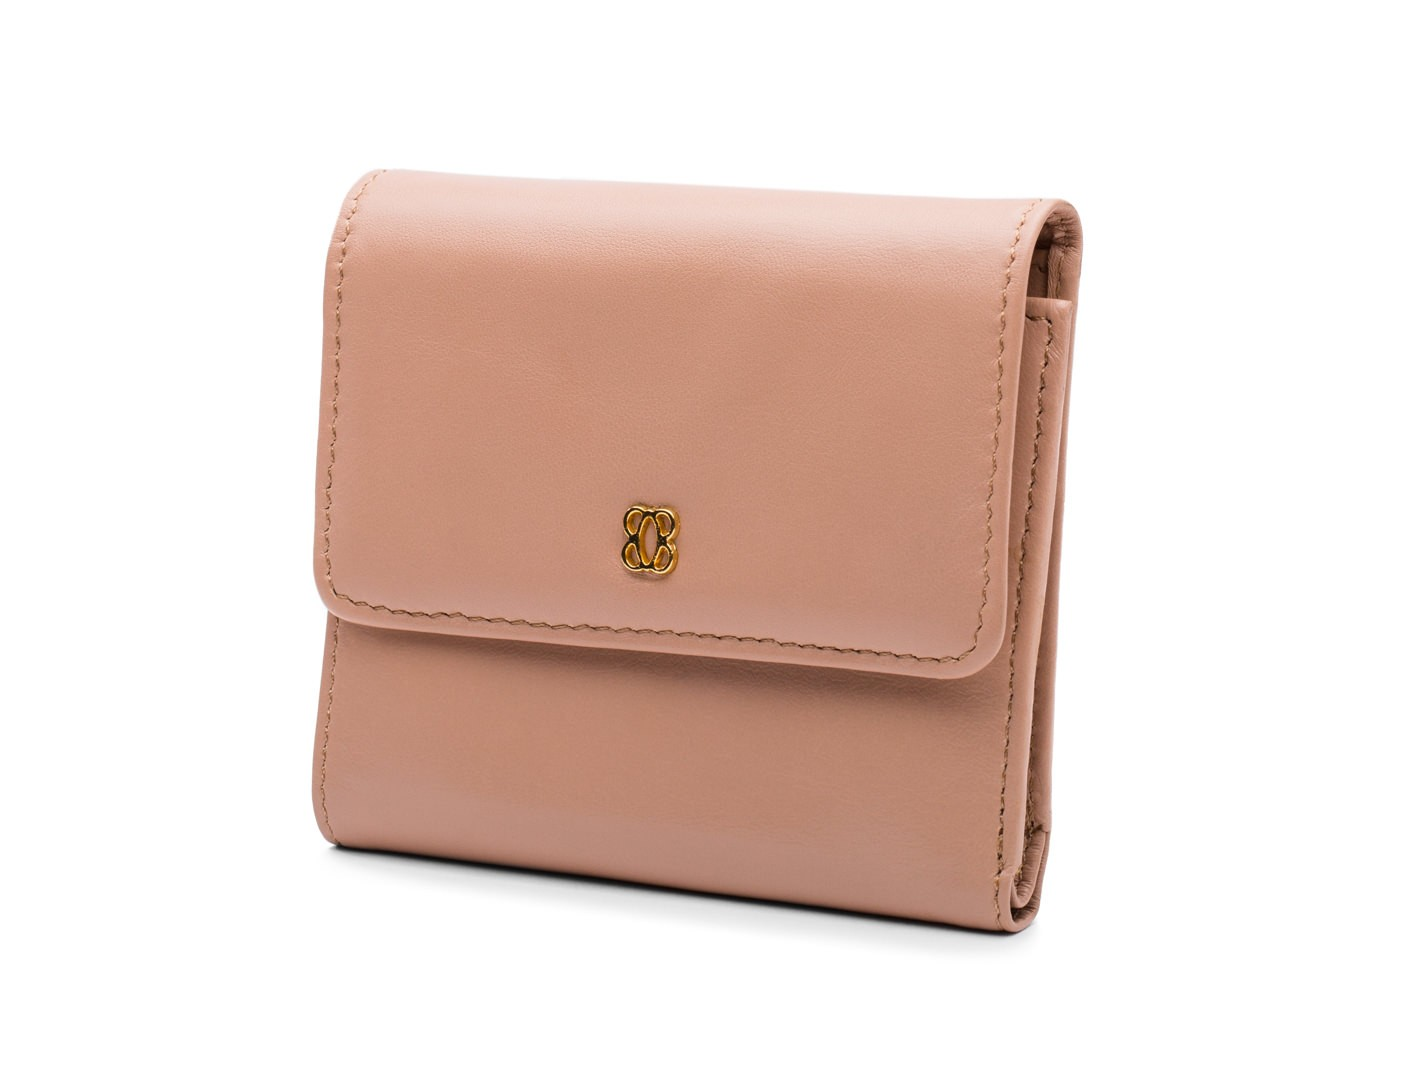 Blush Small Wallet